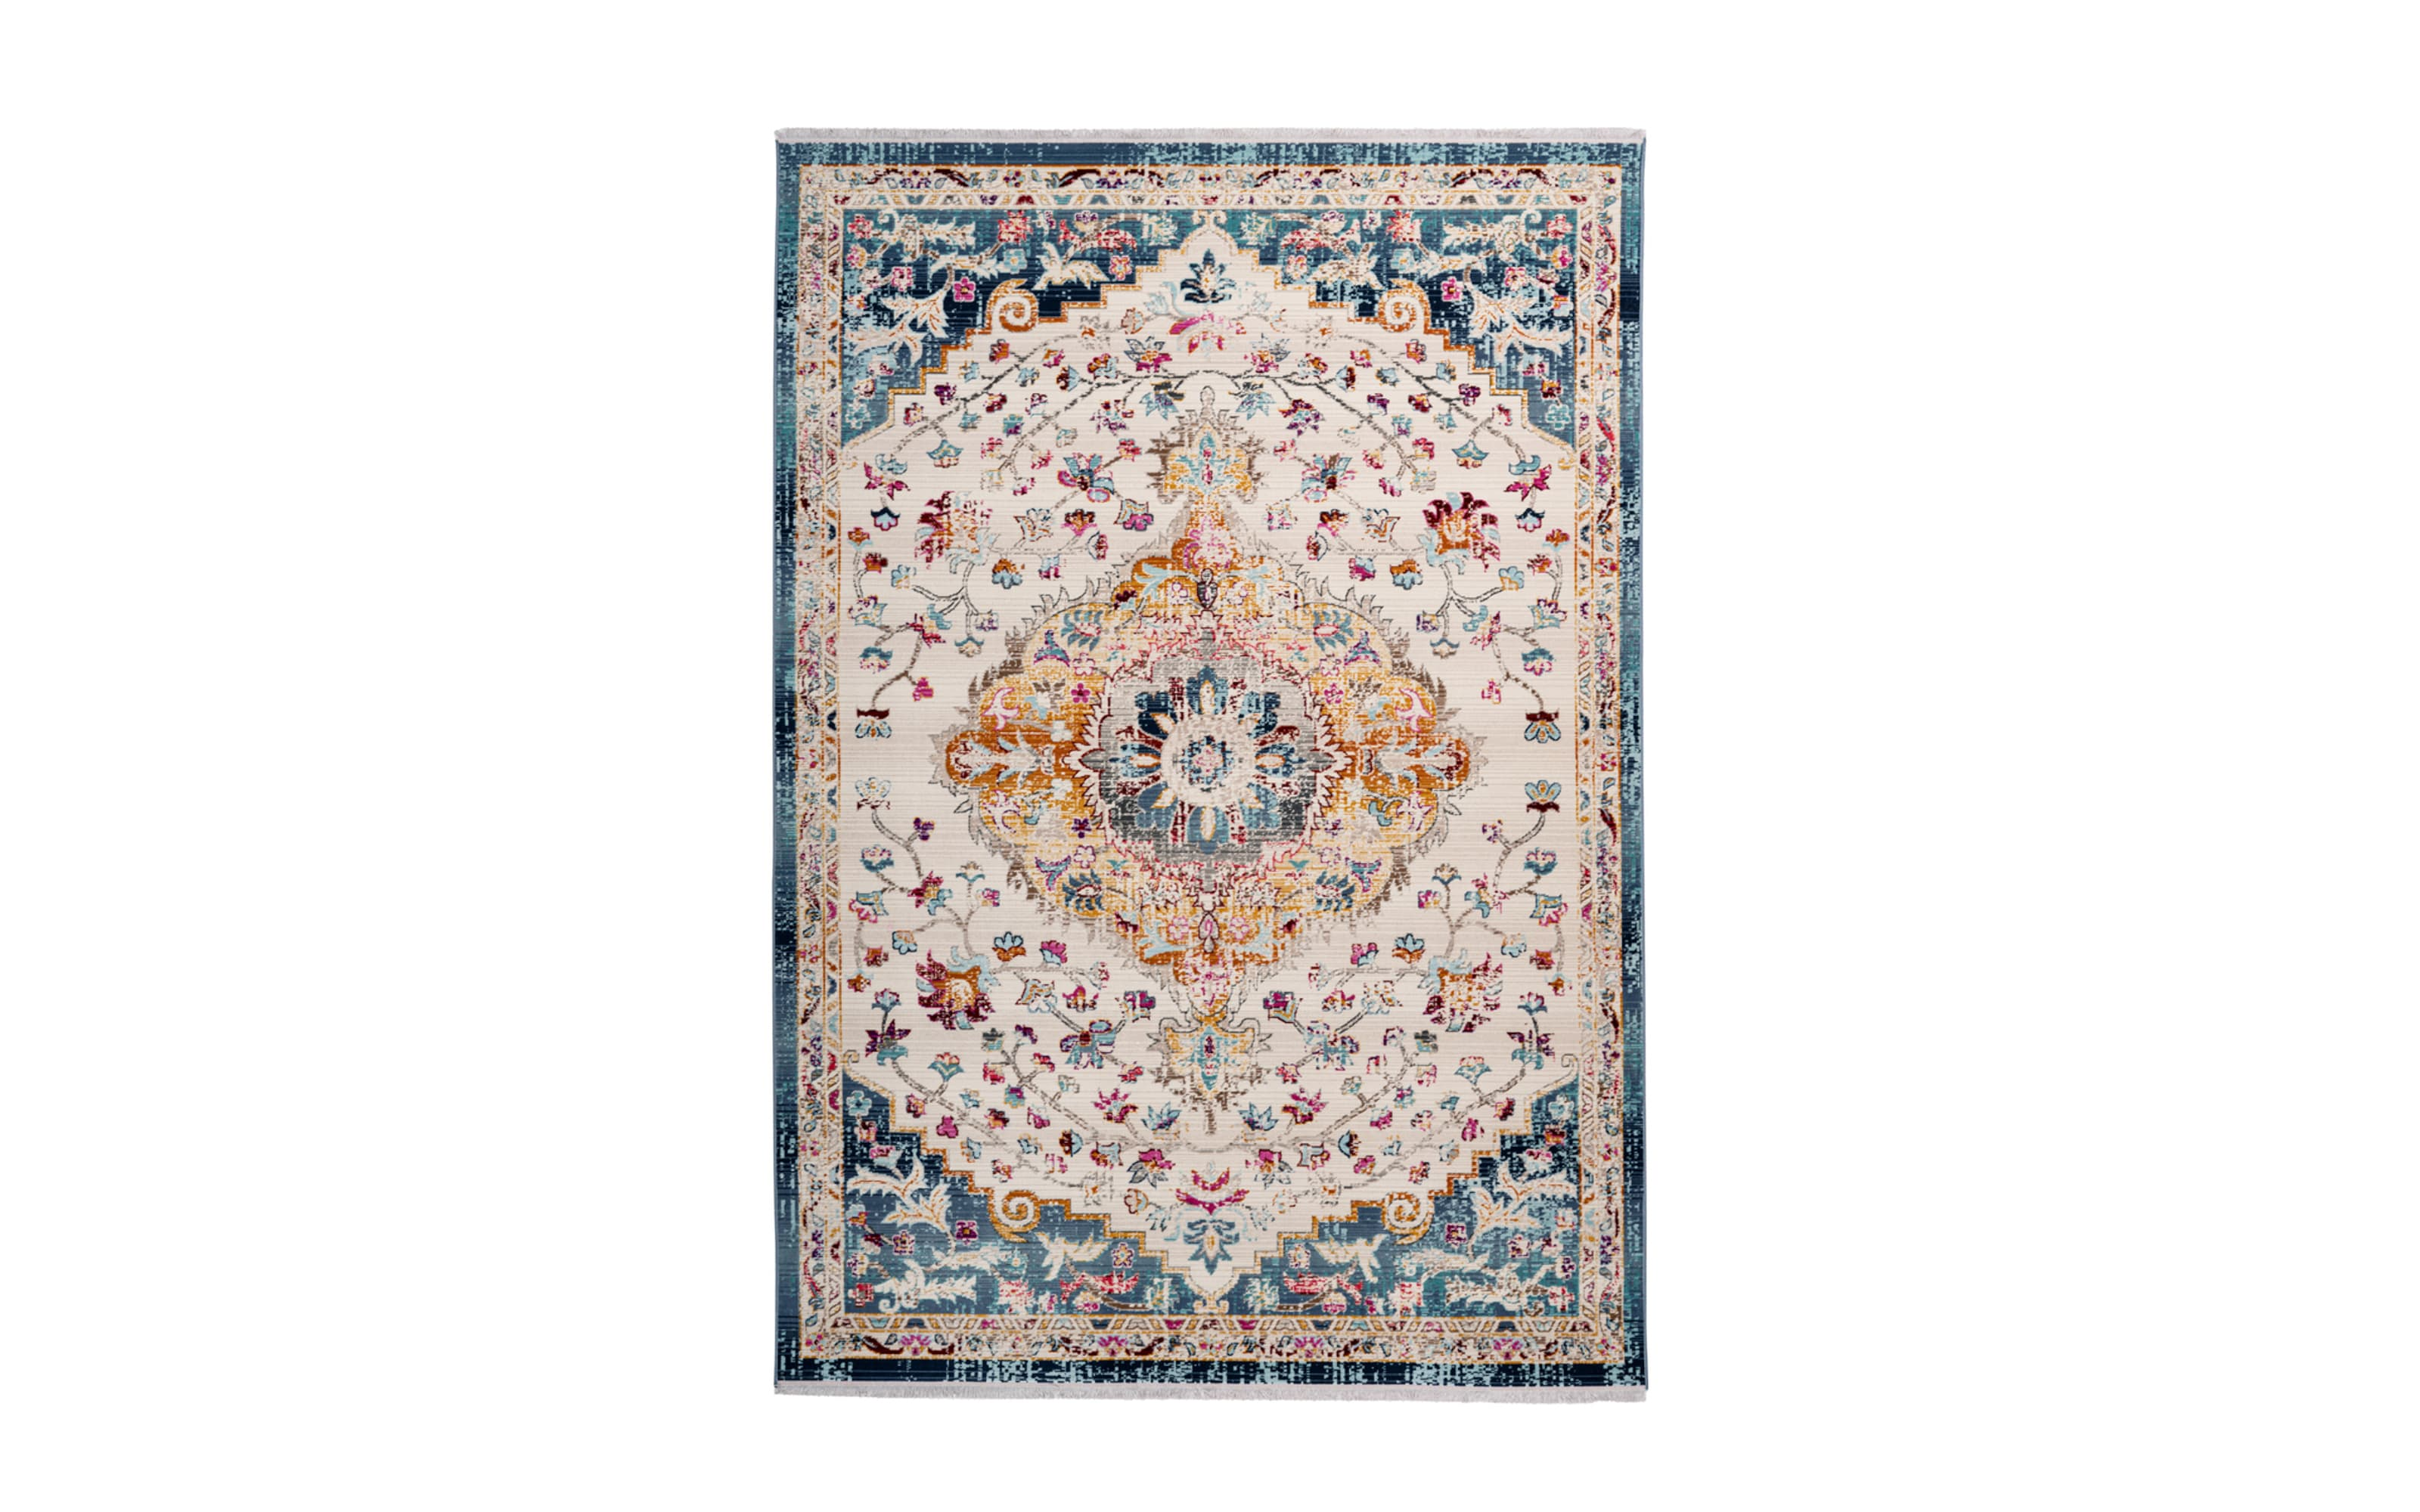 Teppich Anouk 1025 in weiß/blau, 160 x 230 cm